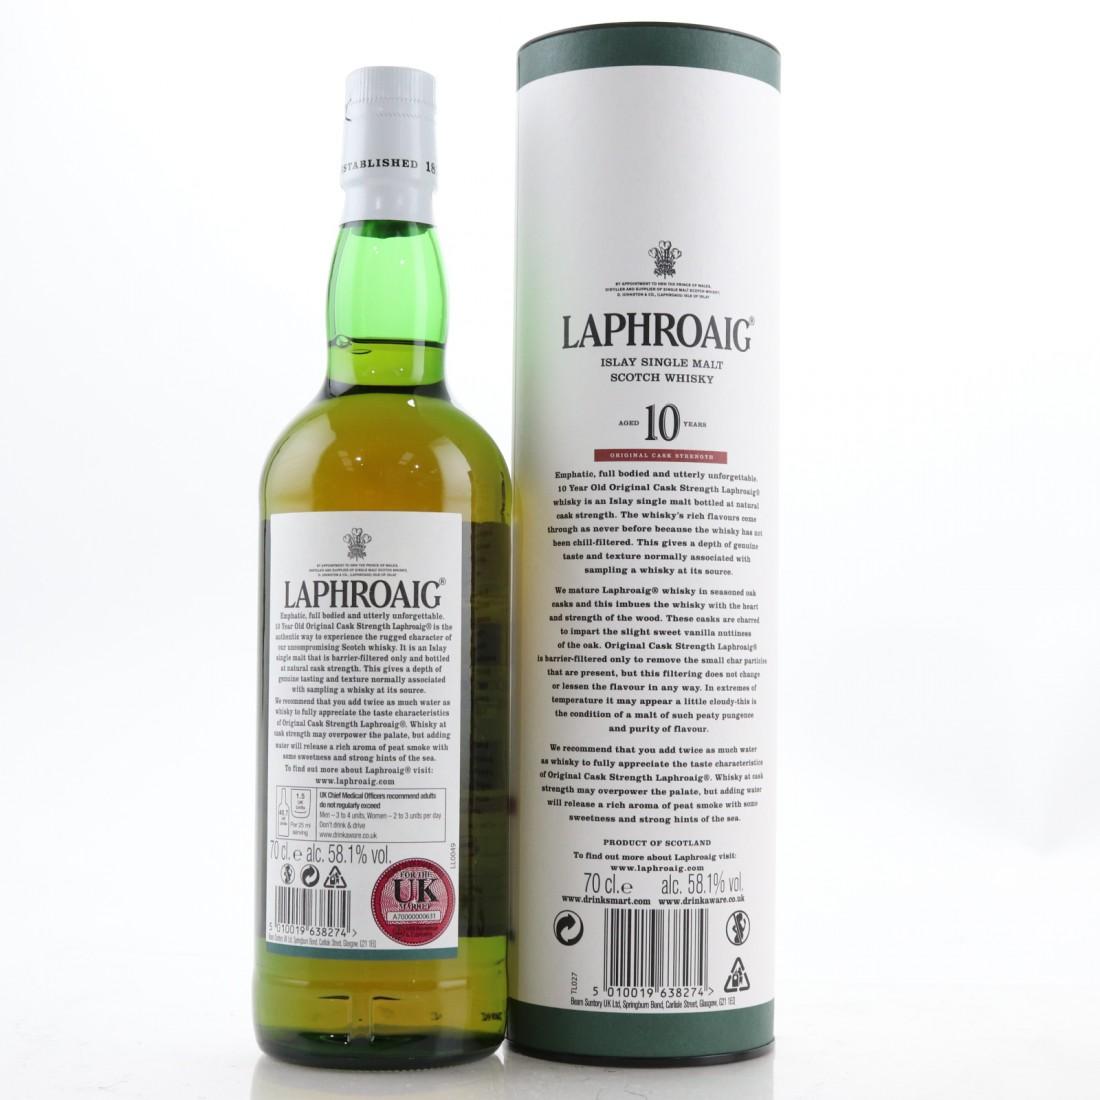 Laphroaig 10 Year Old Cask Strength Batch #009